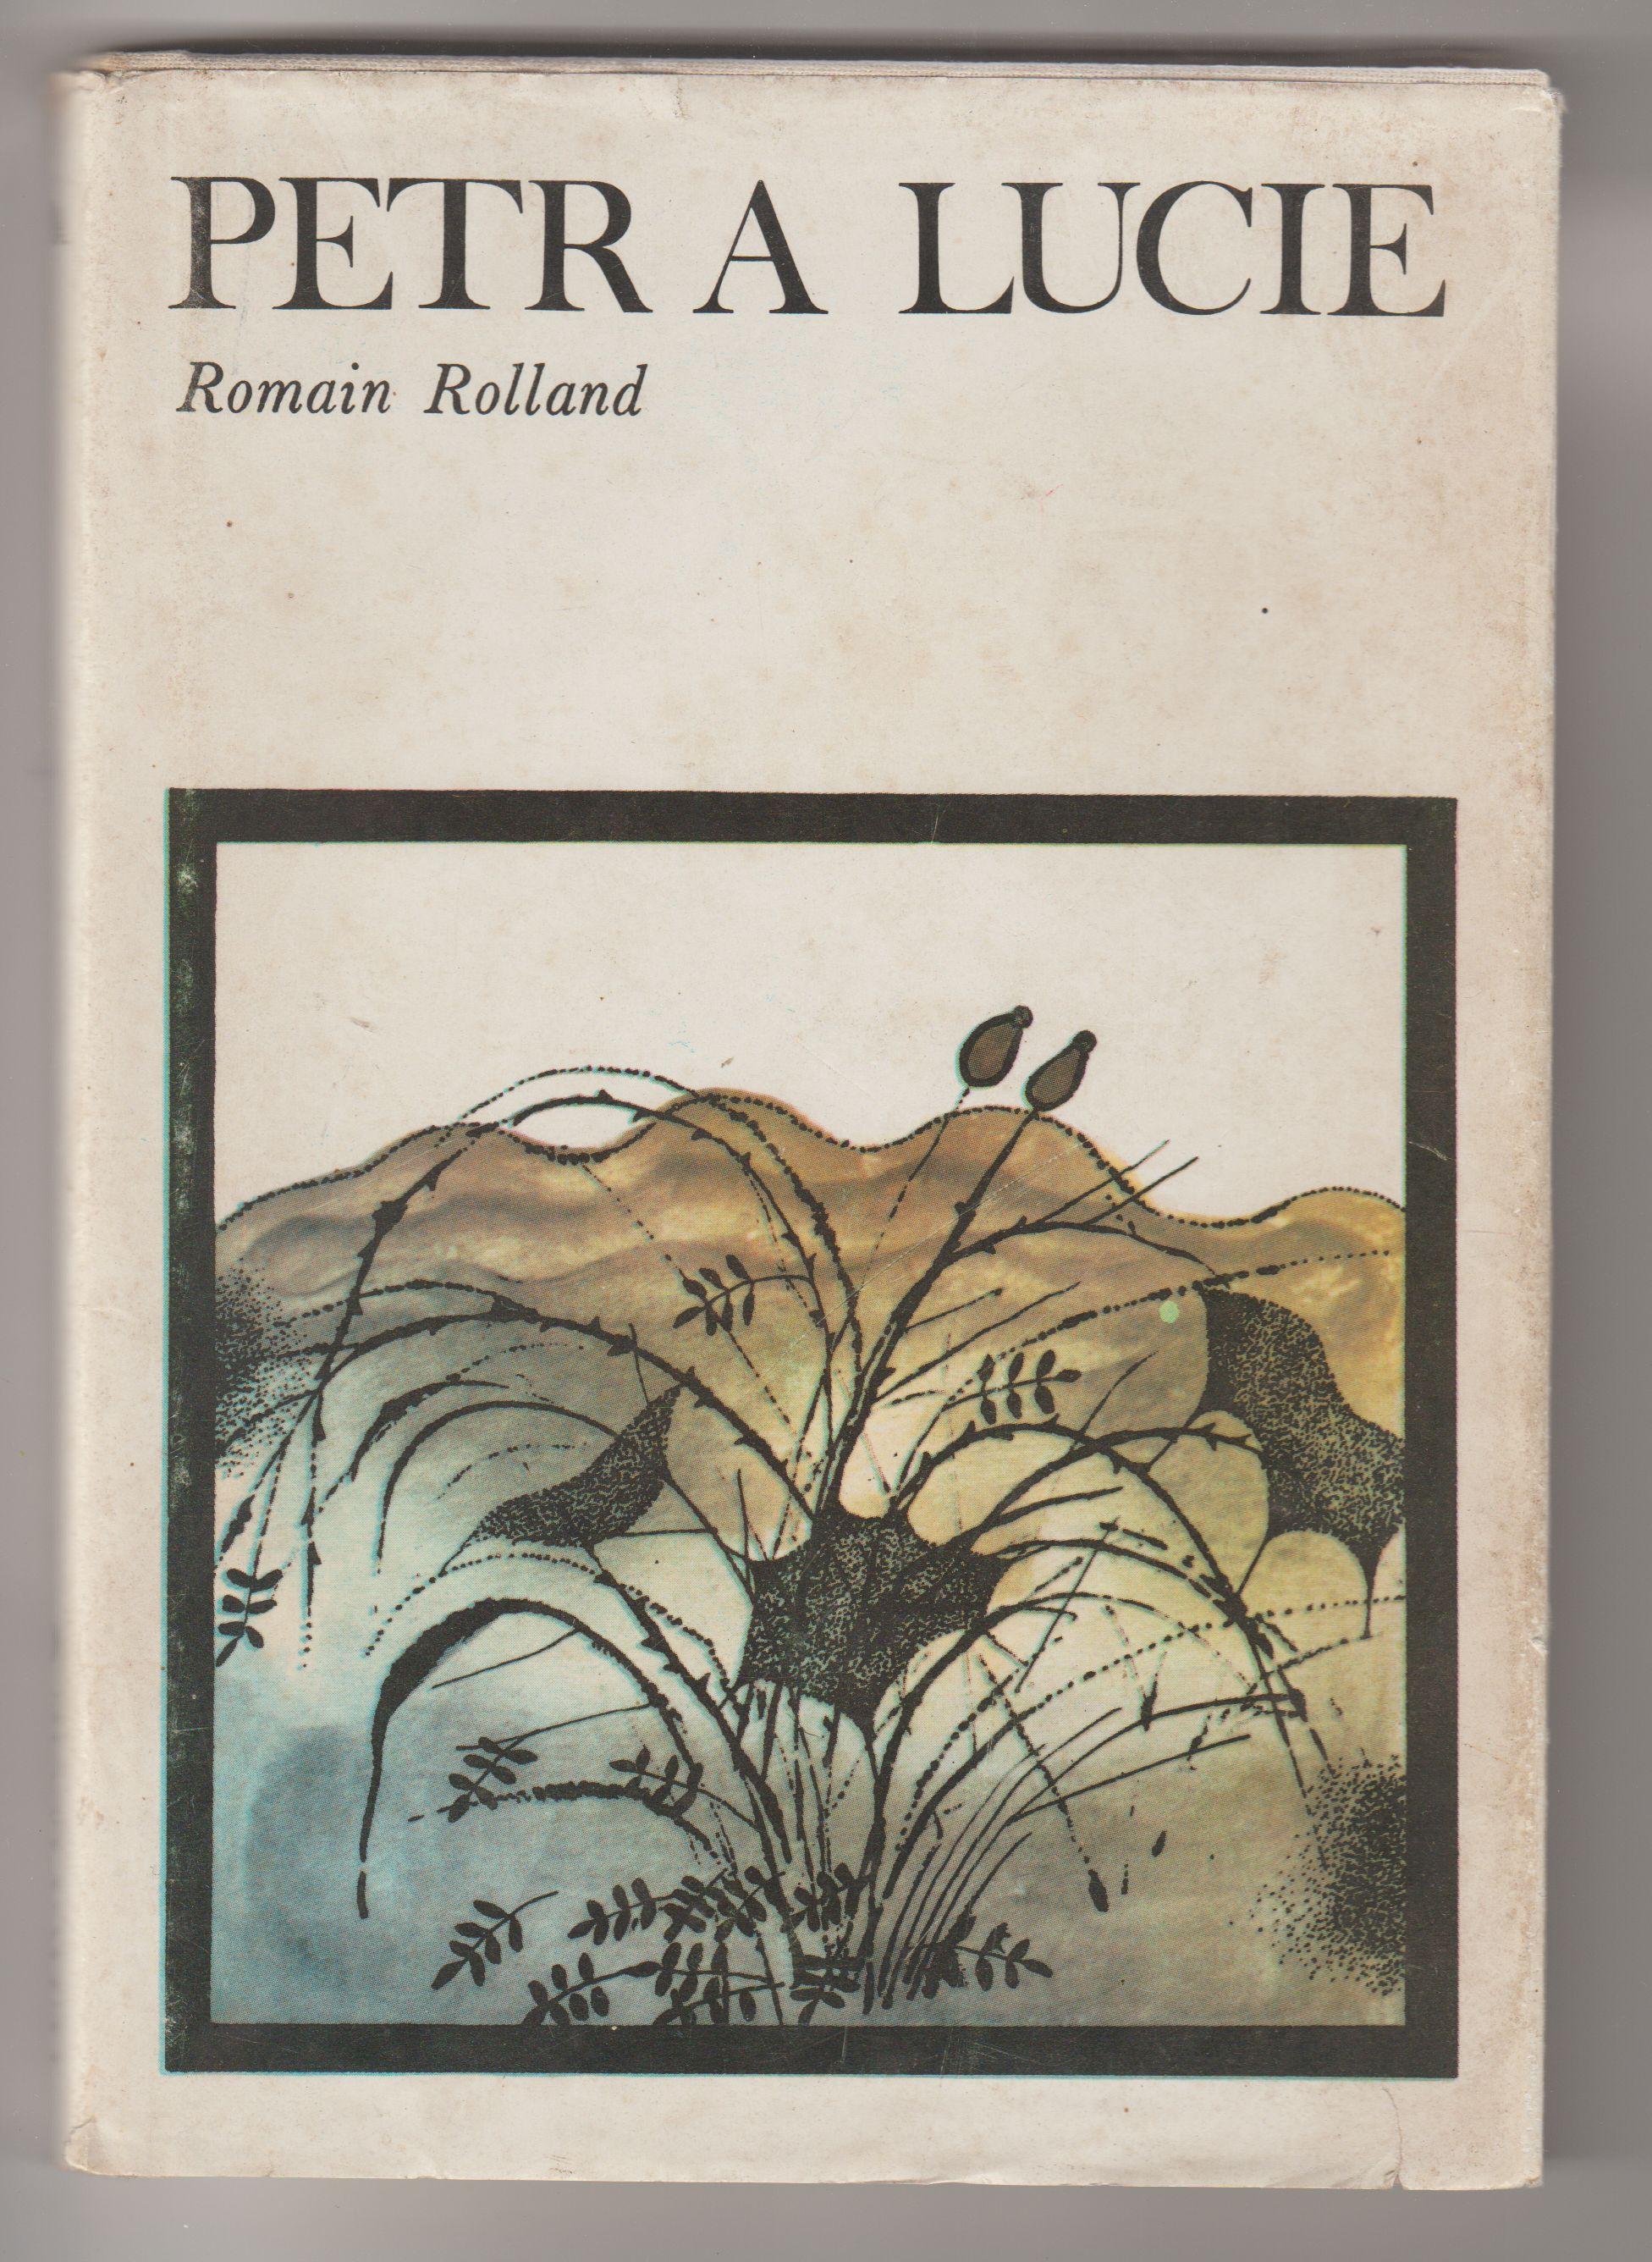 ROLAND ROMAIN PETR A LUCIE EBOOK